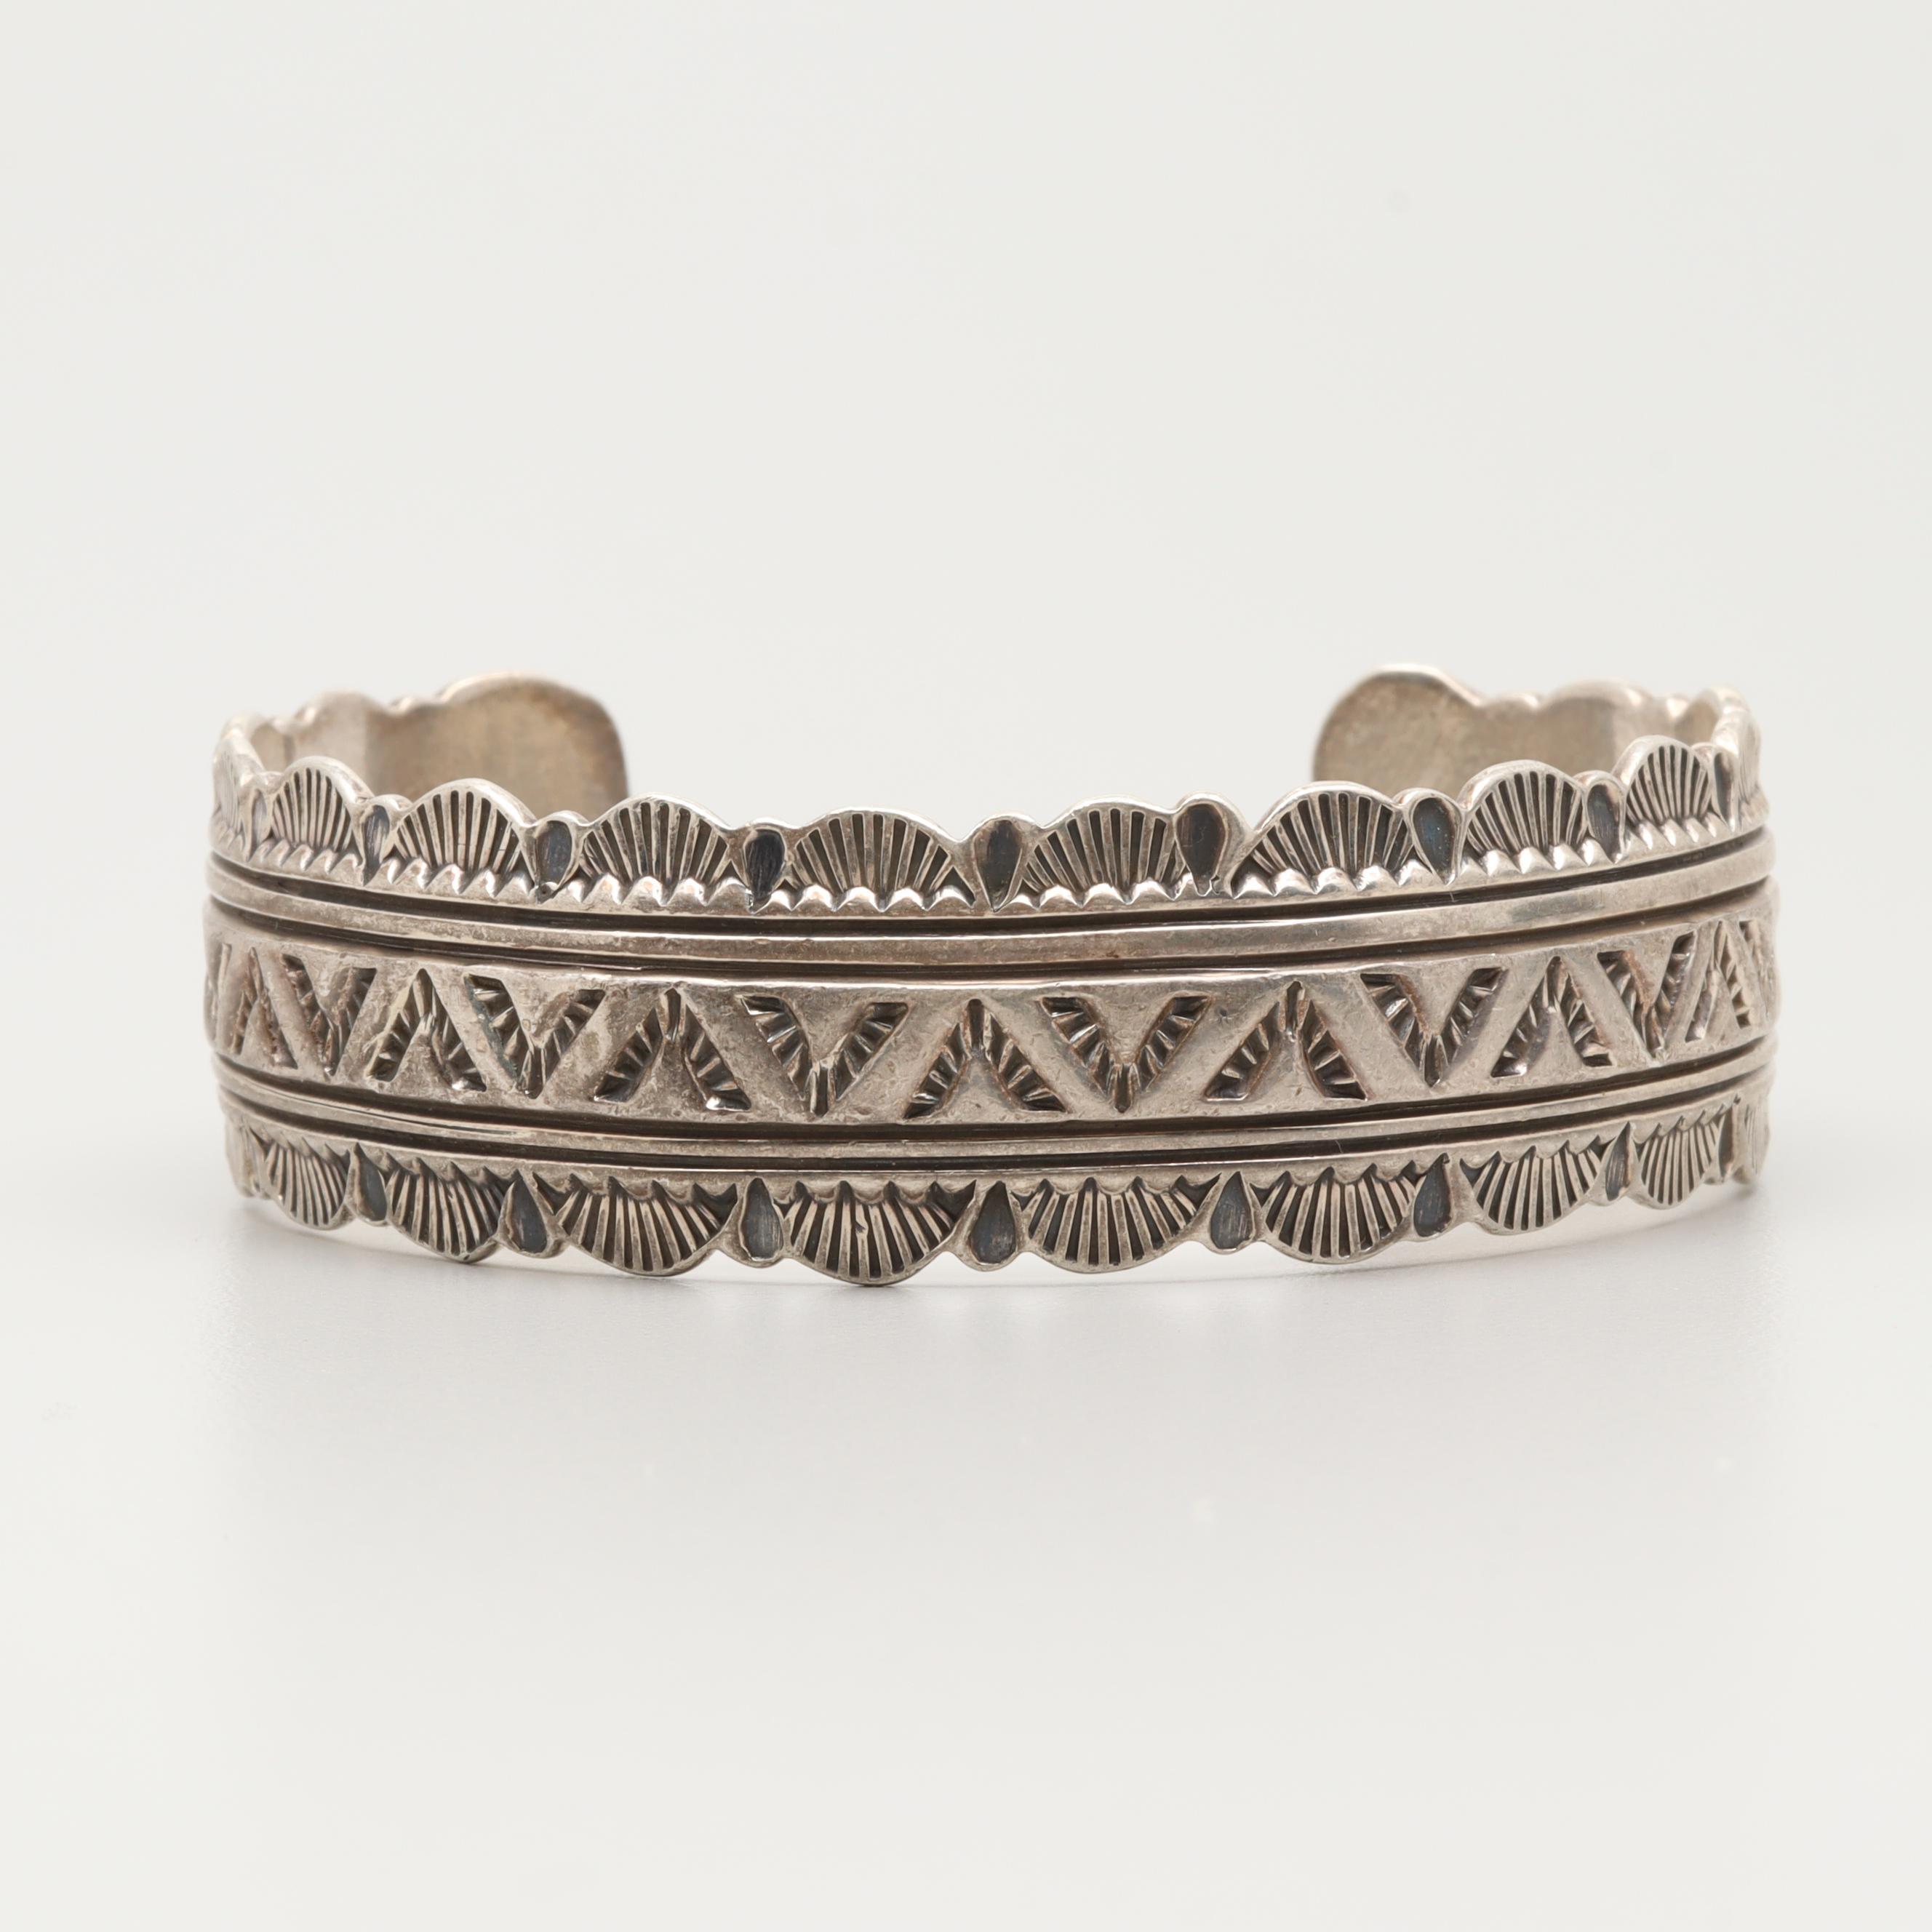 Victor Hicks Navajo Diné Sterling Silver Cuff Bracelet